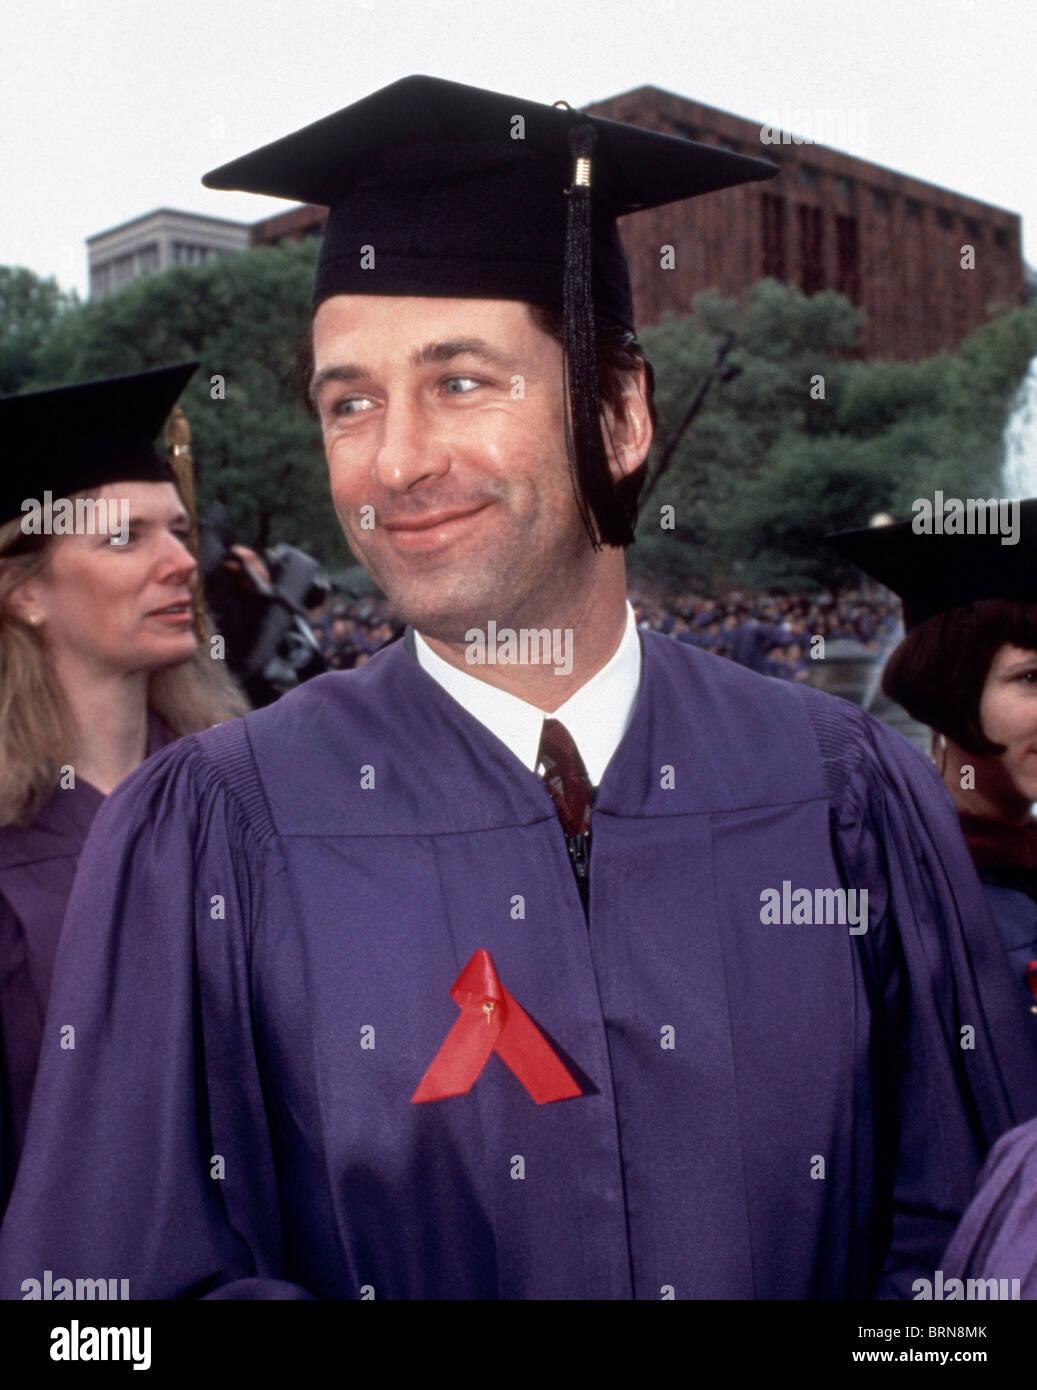 Nyu Graduate In Cap Gown Stock Photos & Nyu Graduate In Cap Gown ...